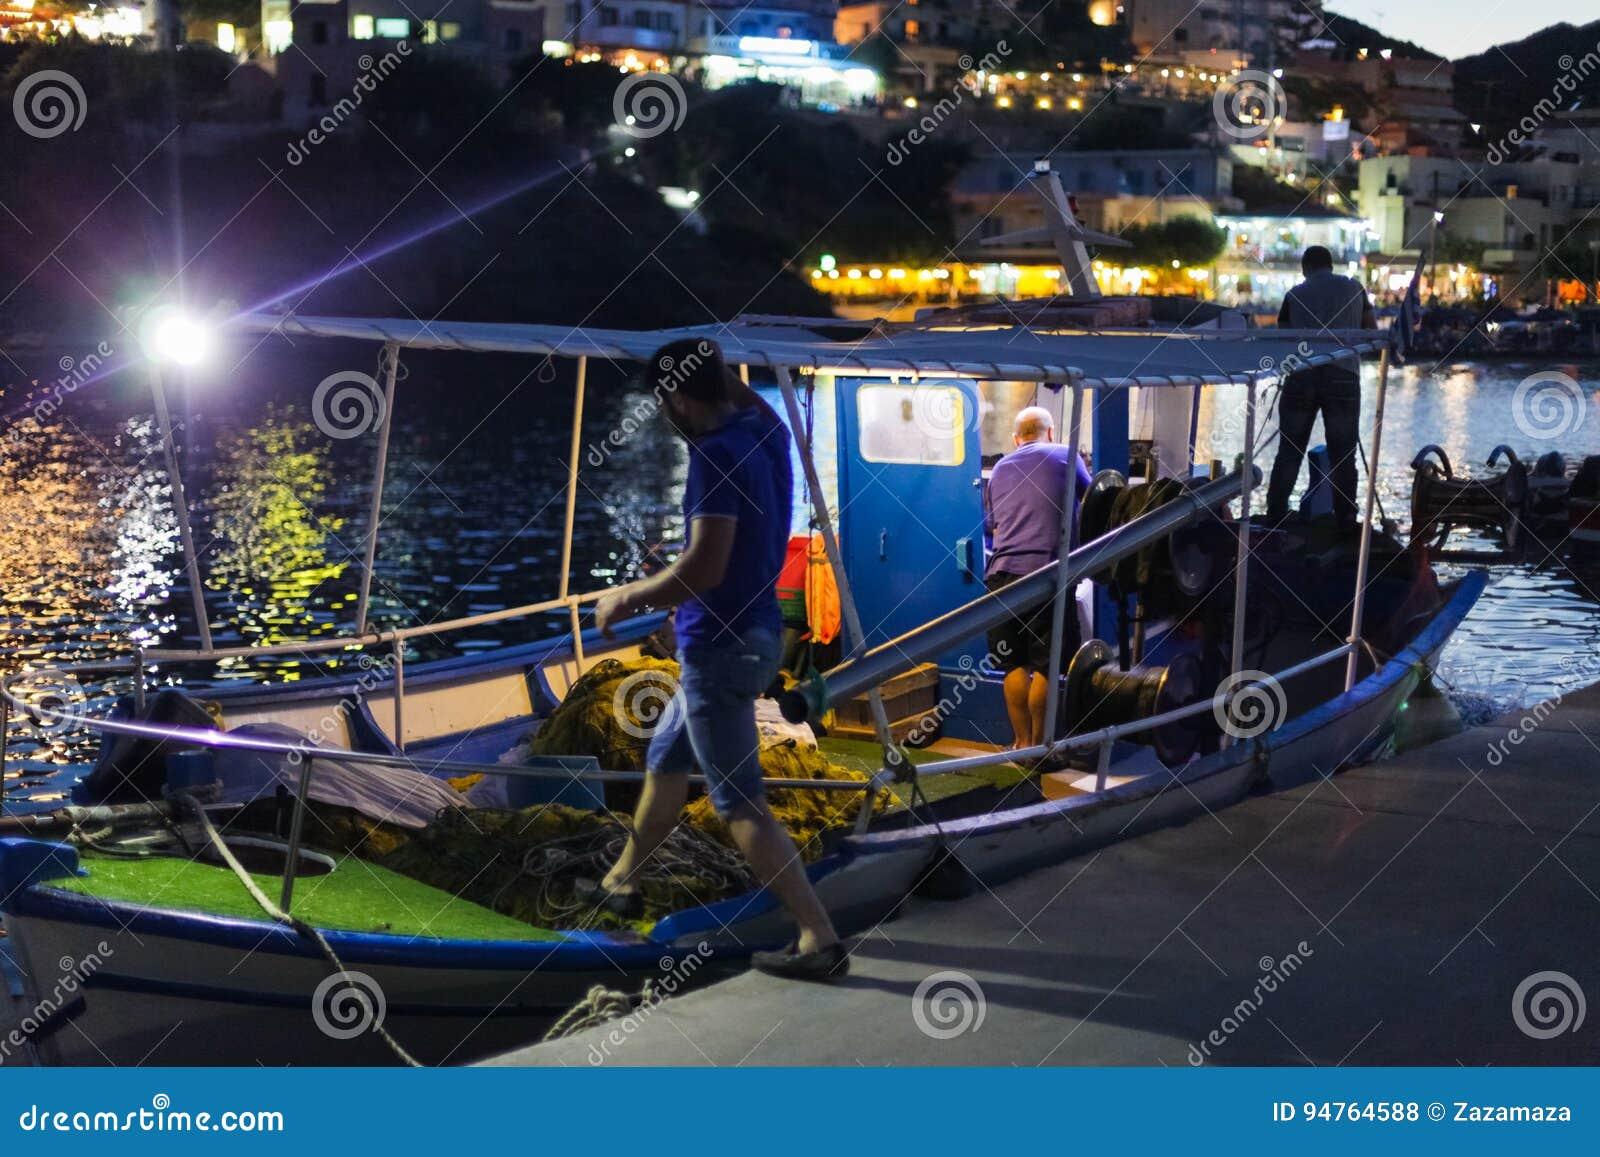 Bali, Island Crete, Greece, - June 30, 2016: Greek fishermen are leaving for night catching fish on the fishing boat